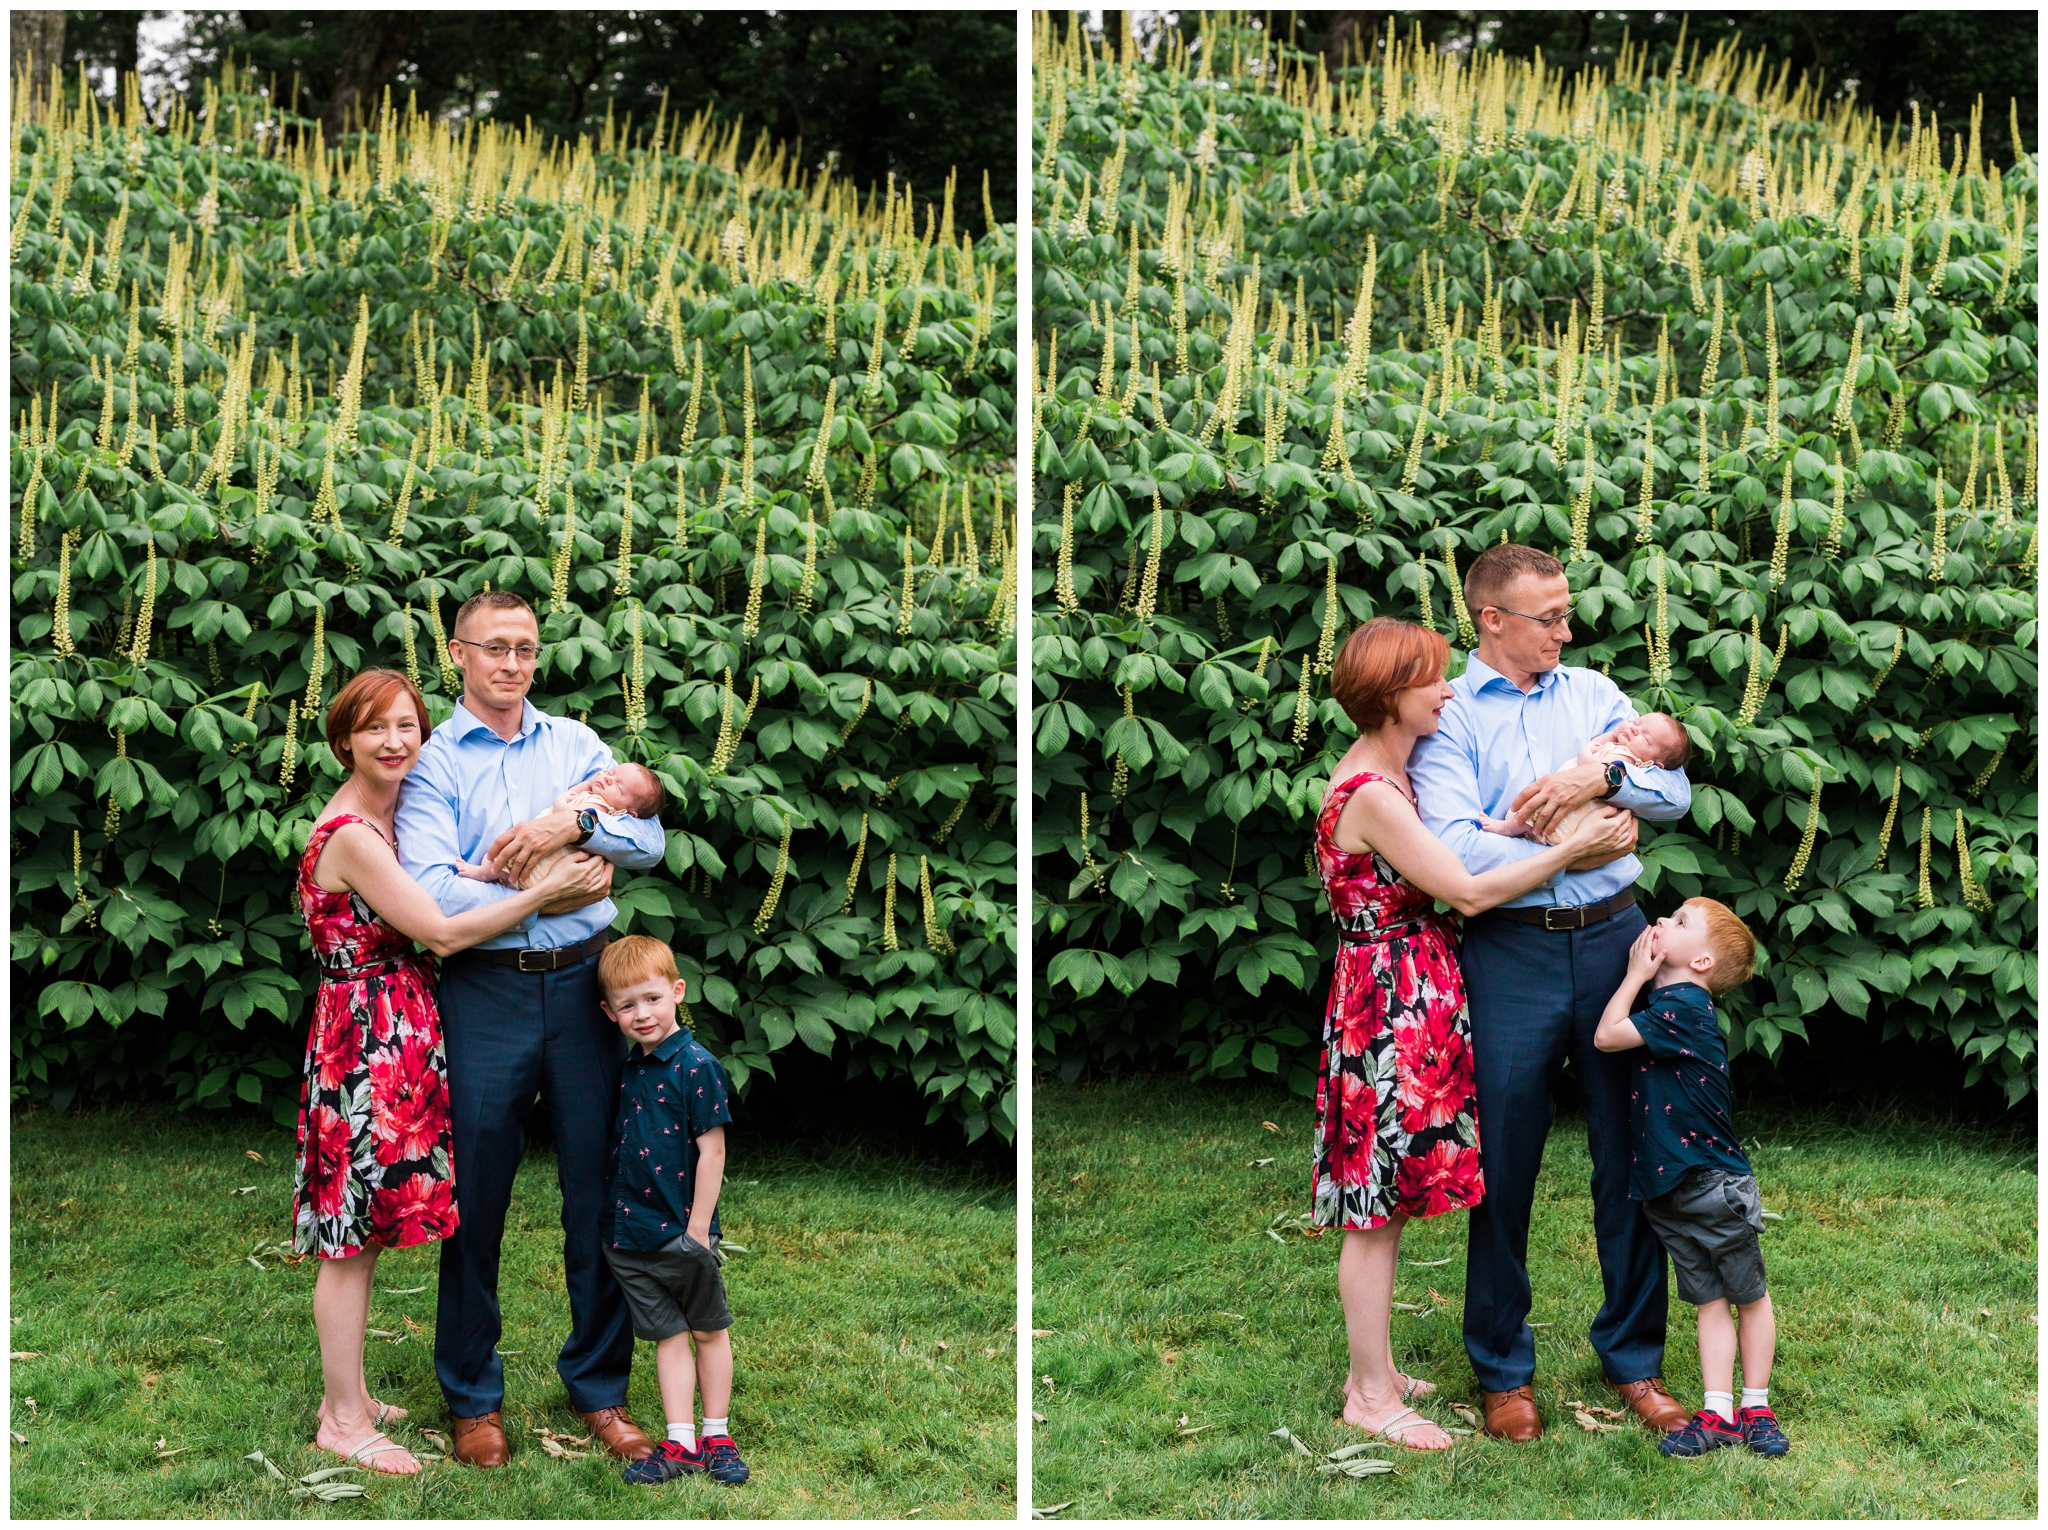 emily grace photography, lancaster pa, family portrait, lifestyle photographer